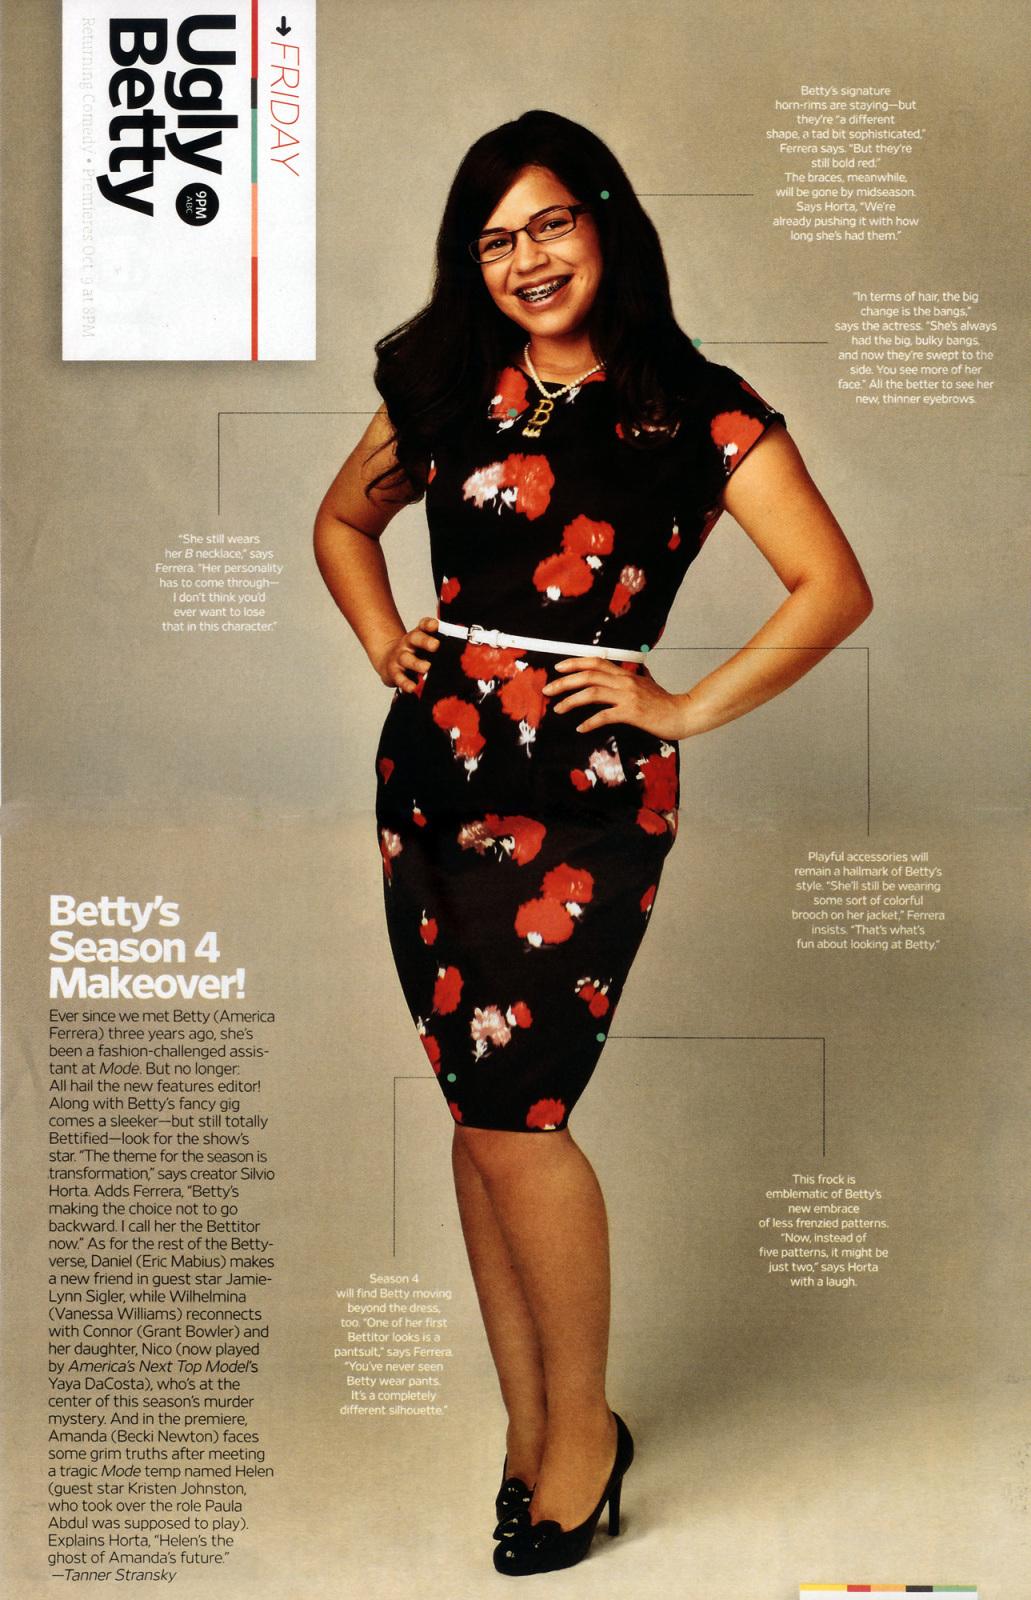 betty's new look for season 4!!